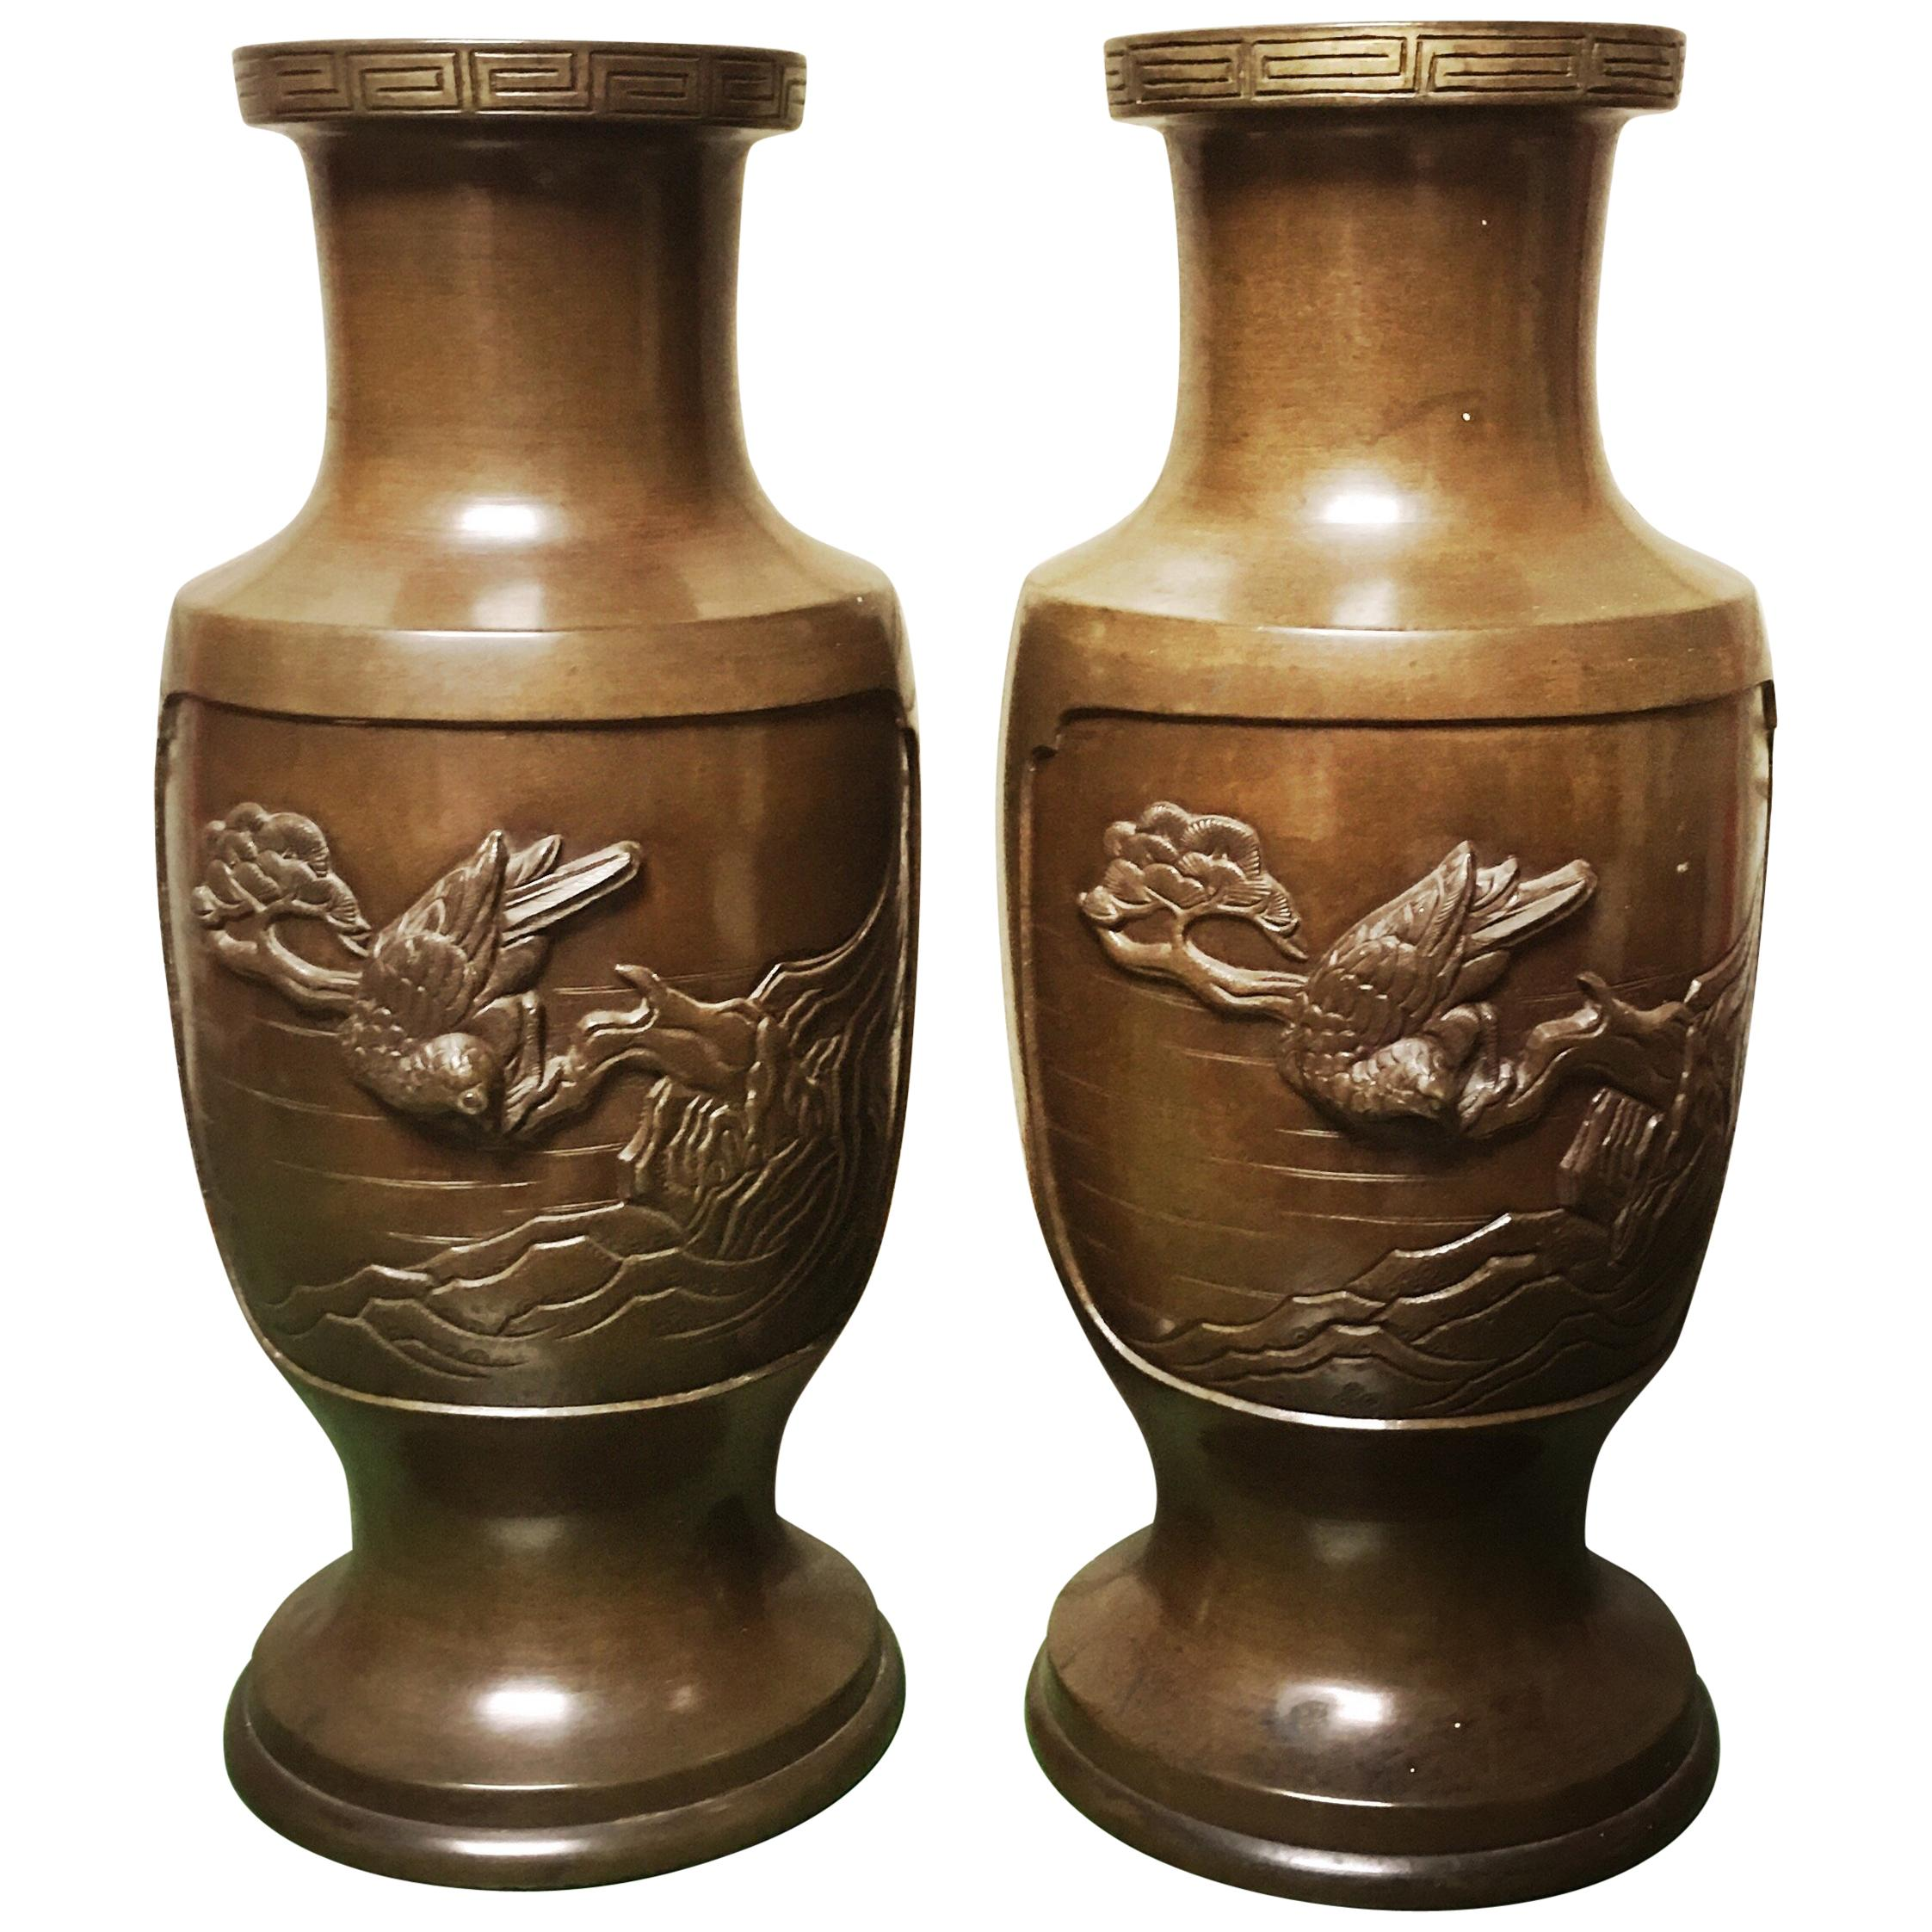 Pair of 19th Century Japanese Bronze Vases